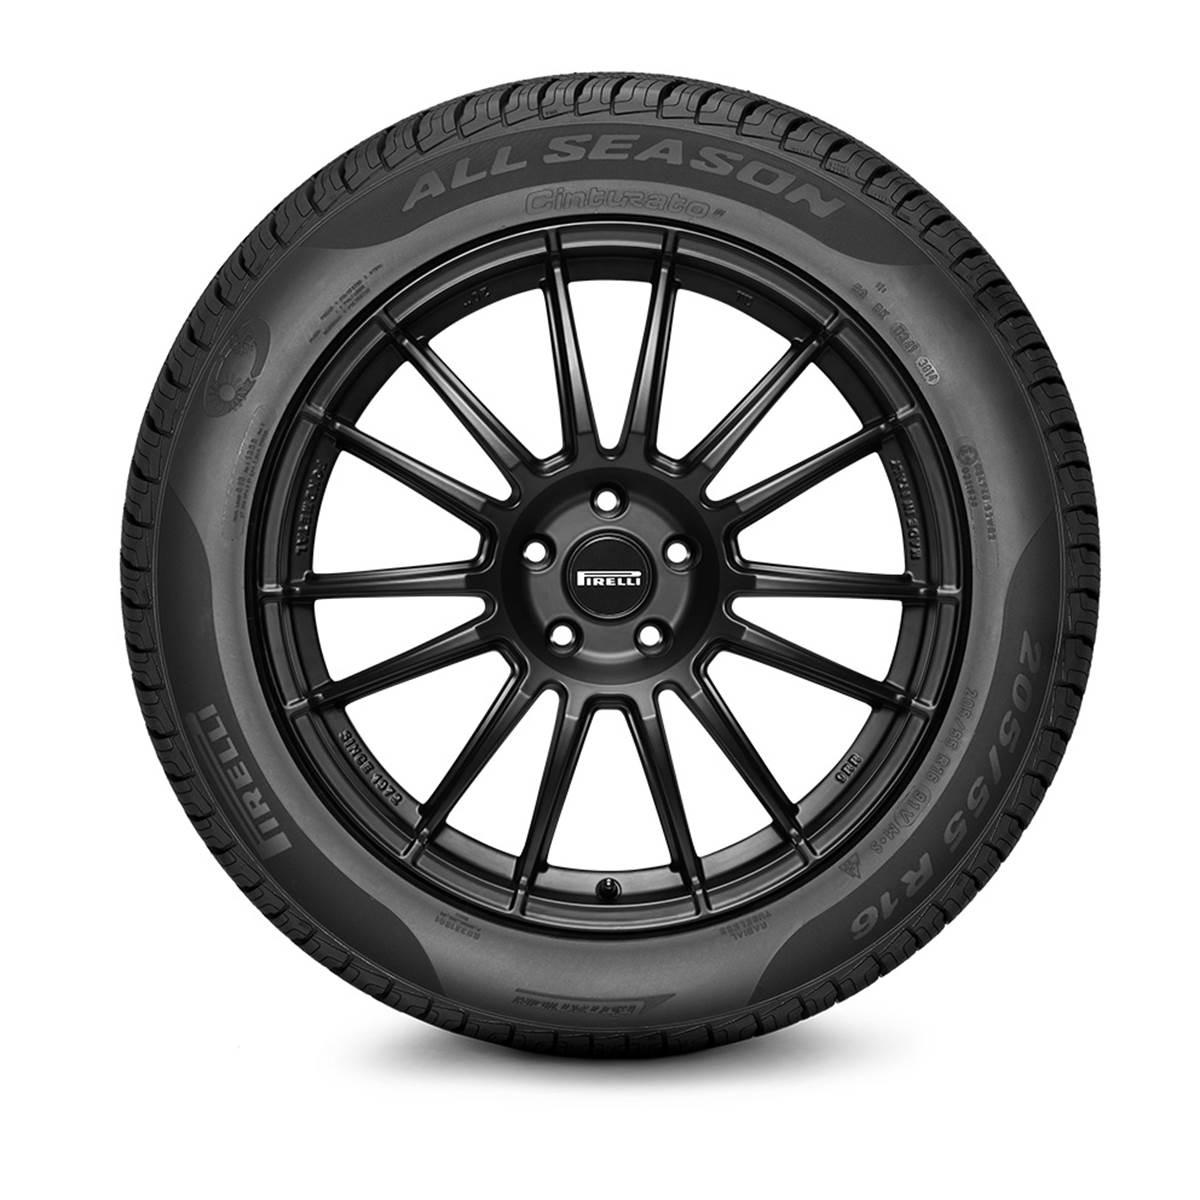 Pneu 4 Saisons Pirelli 175/65R15 84H Cinturato All Season